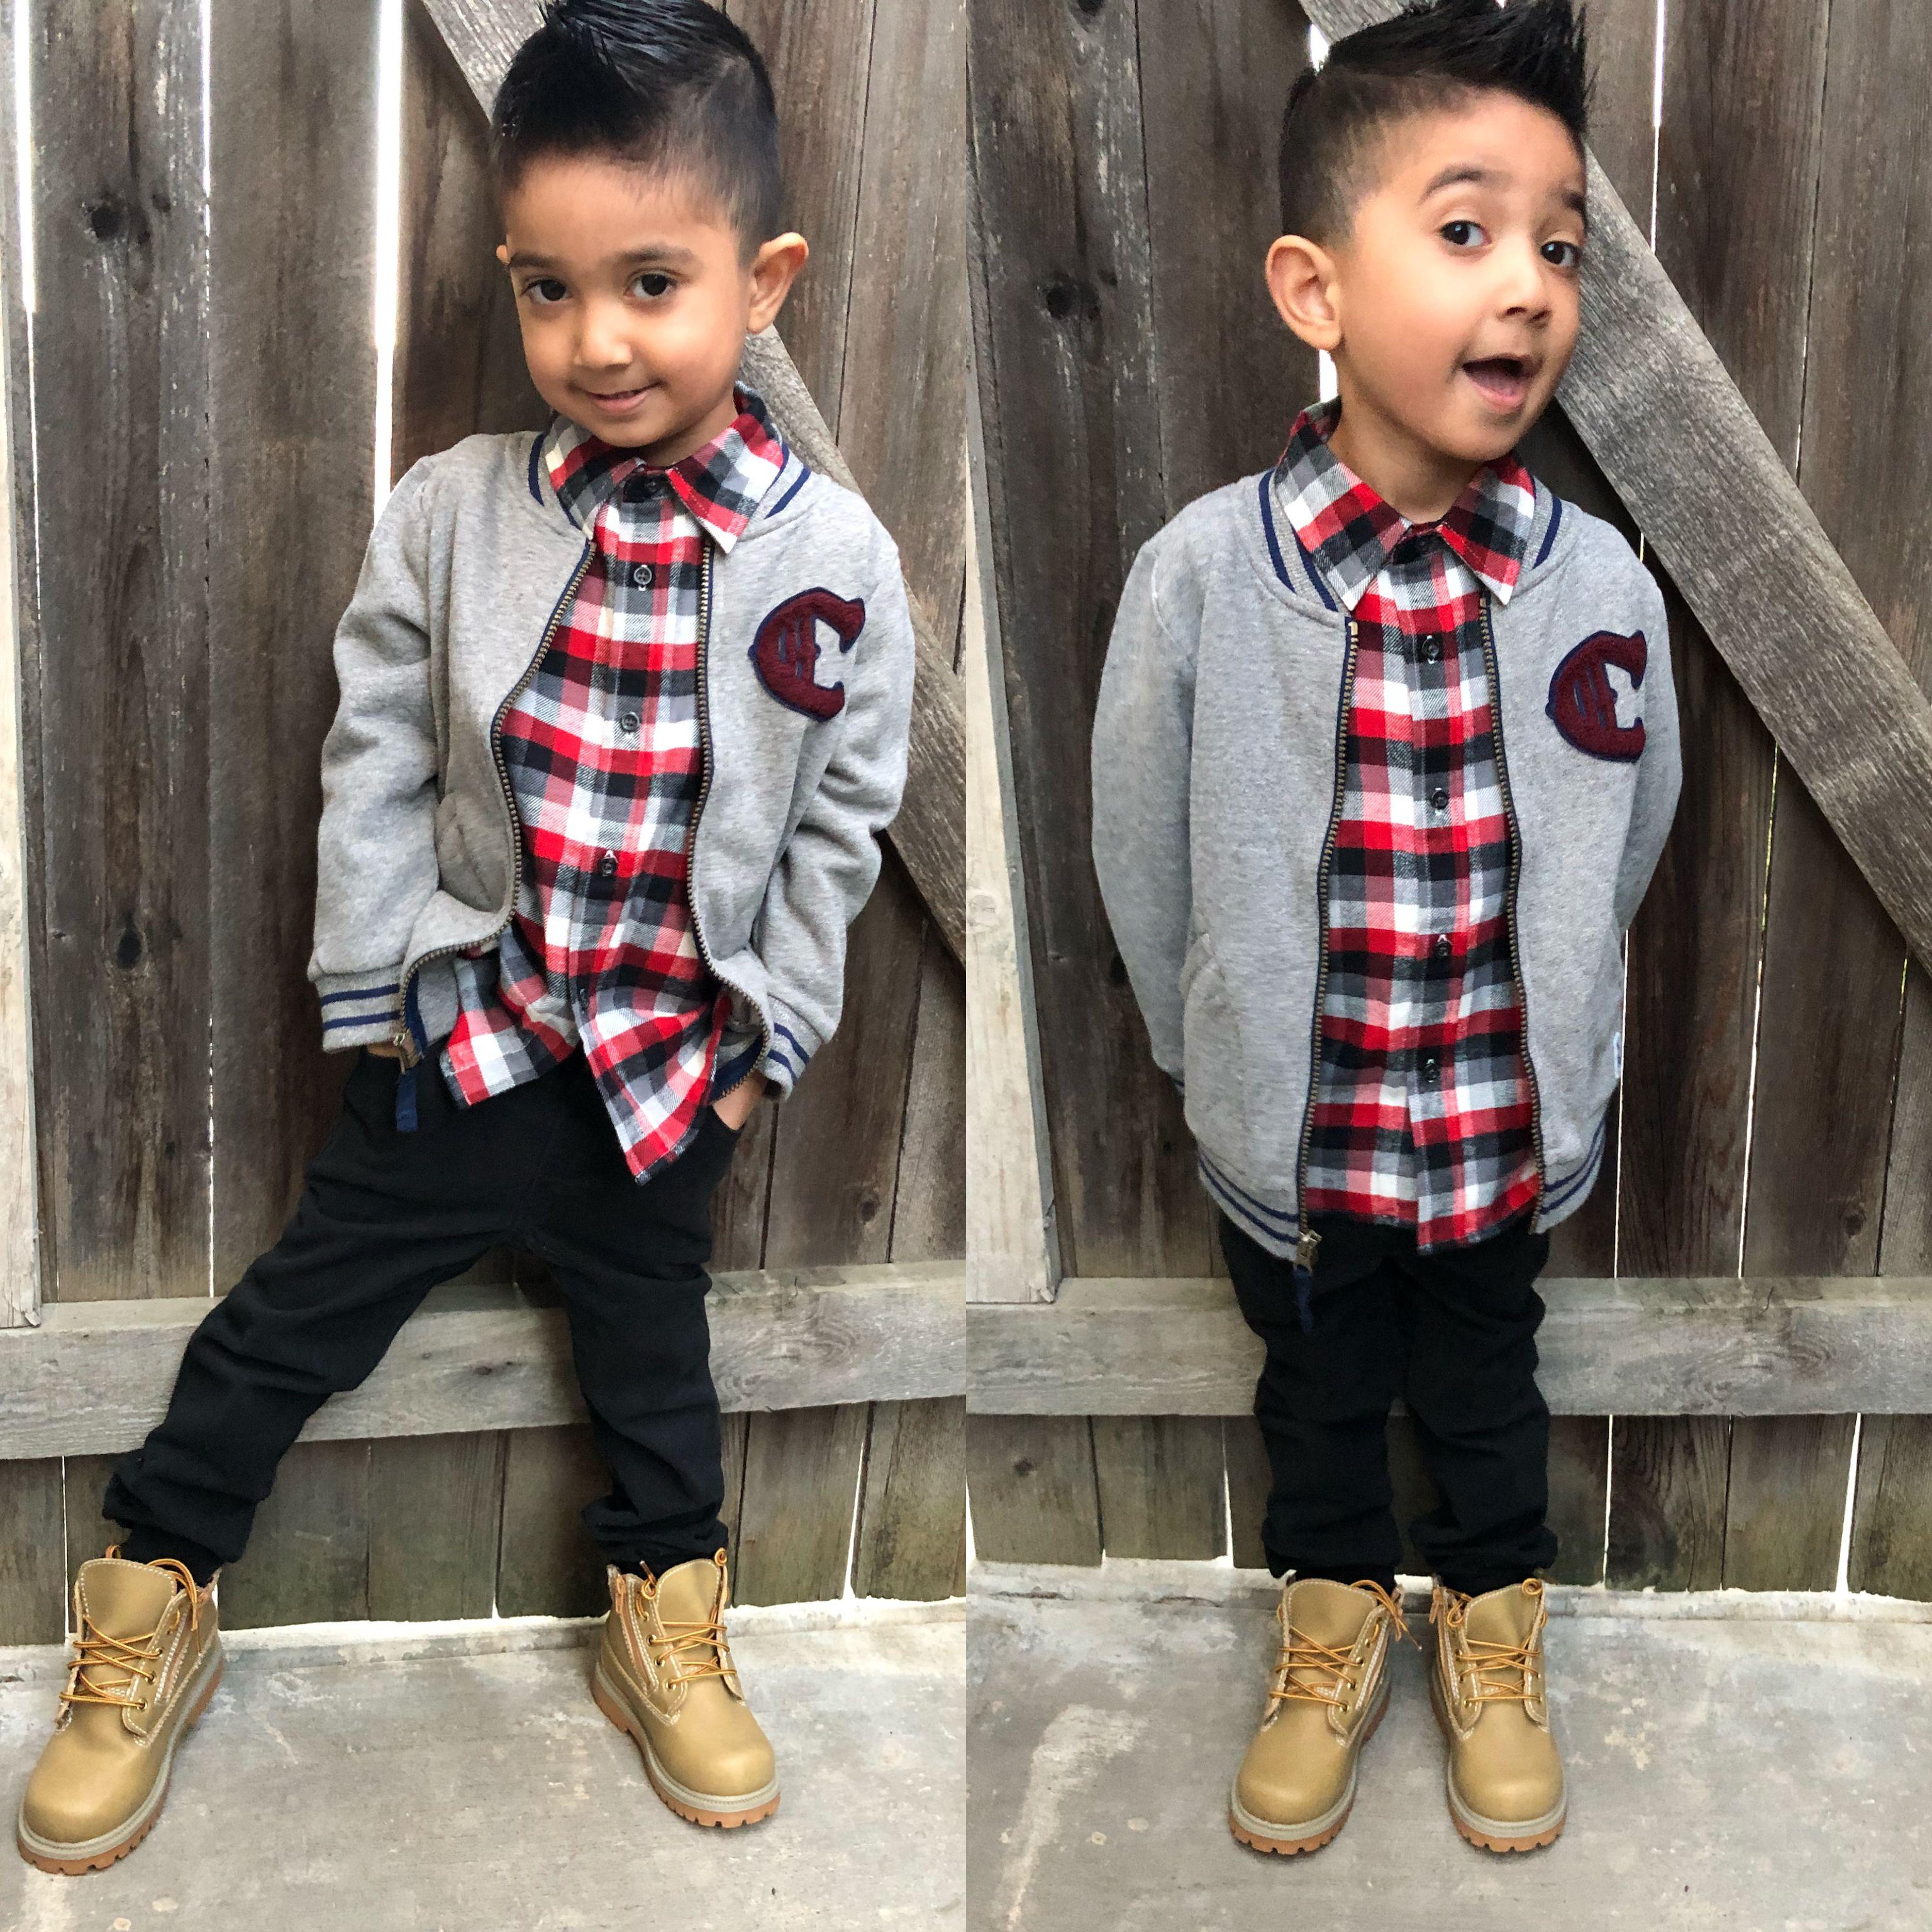 Little Boys Winter Outfit Boots Plaidshirt Plaids Timberlands Toddlerboysfashion Kidswinteroutfit Boys Winter Clothes Kids Outfits Boy Outfits